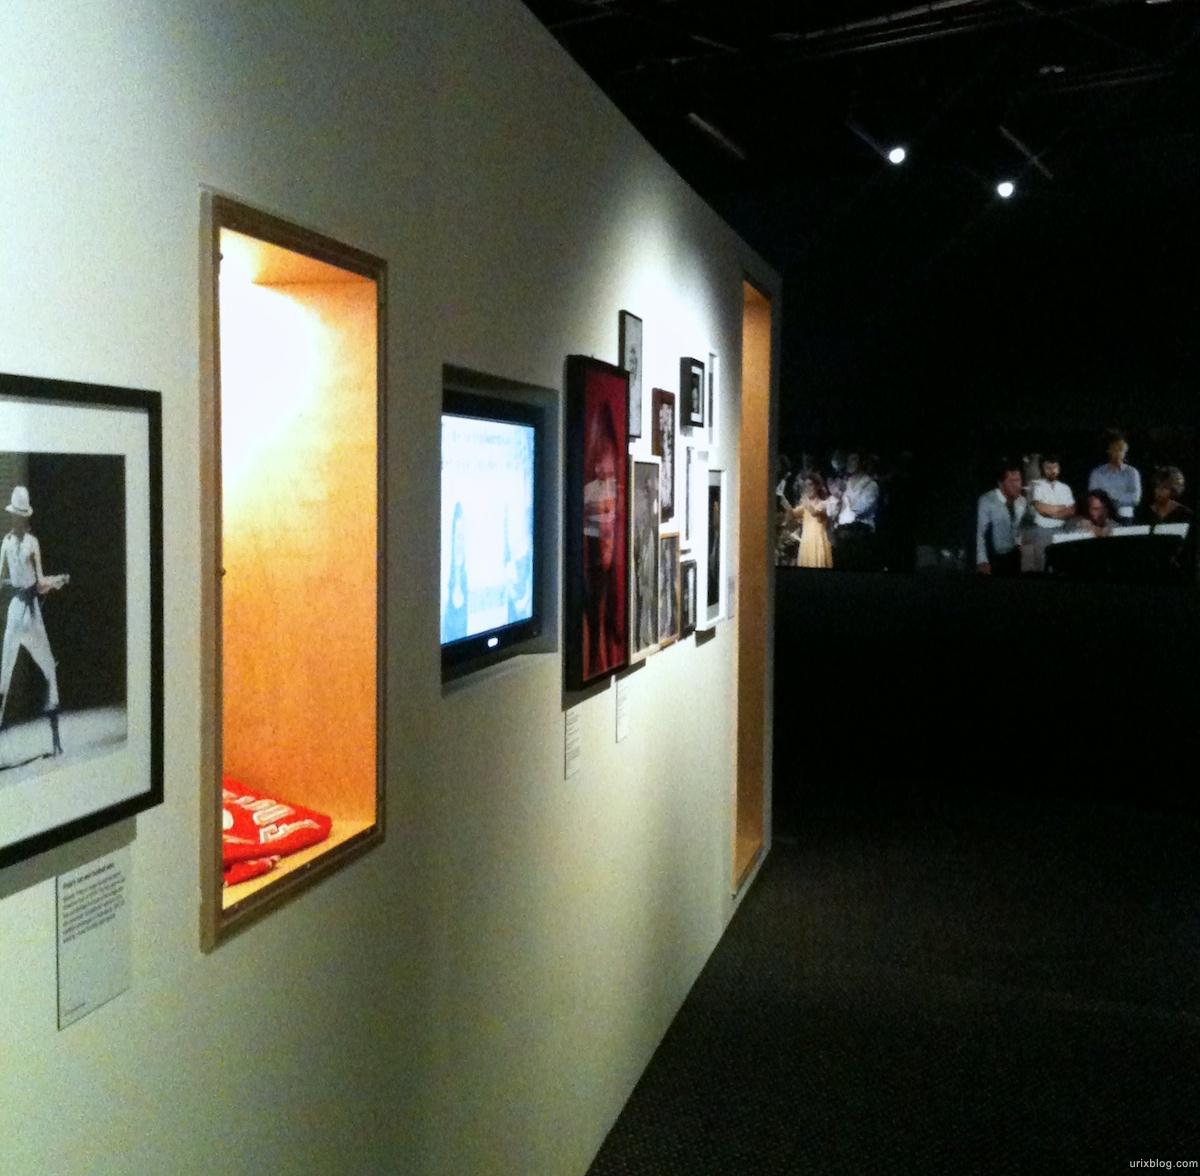 2010 2011 Sydney Australian ABBAWORLD, Powerhouse Museum